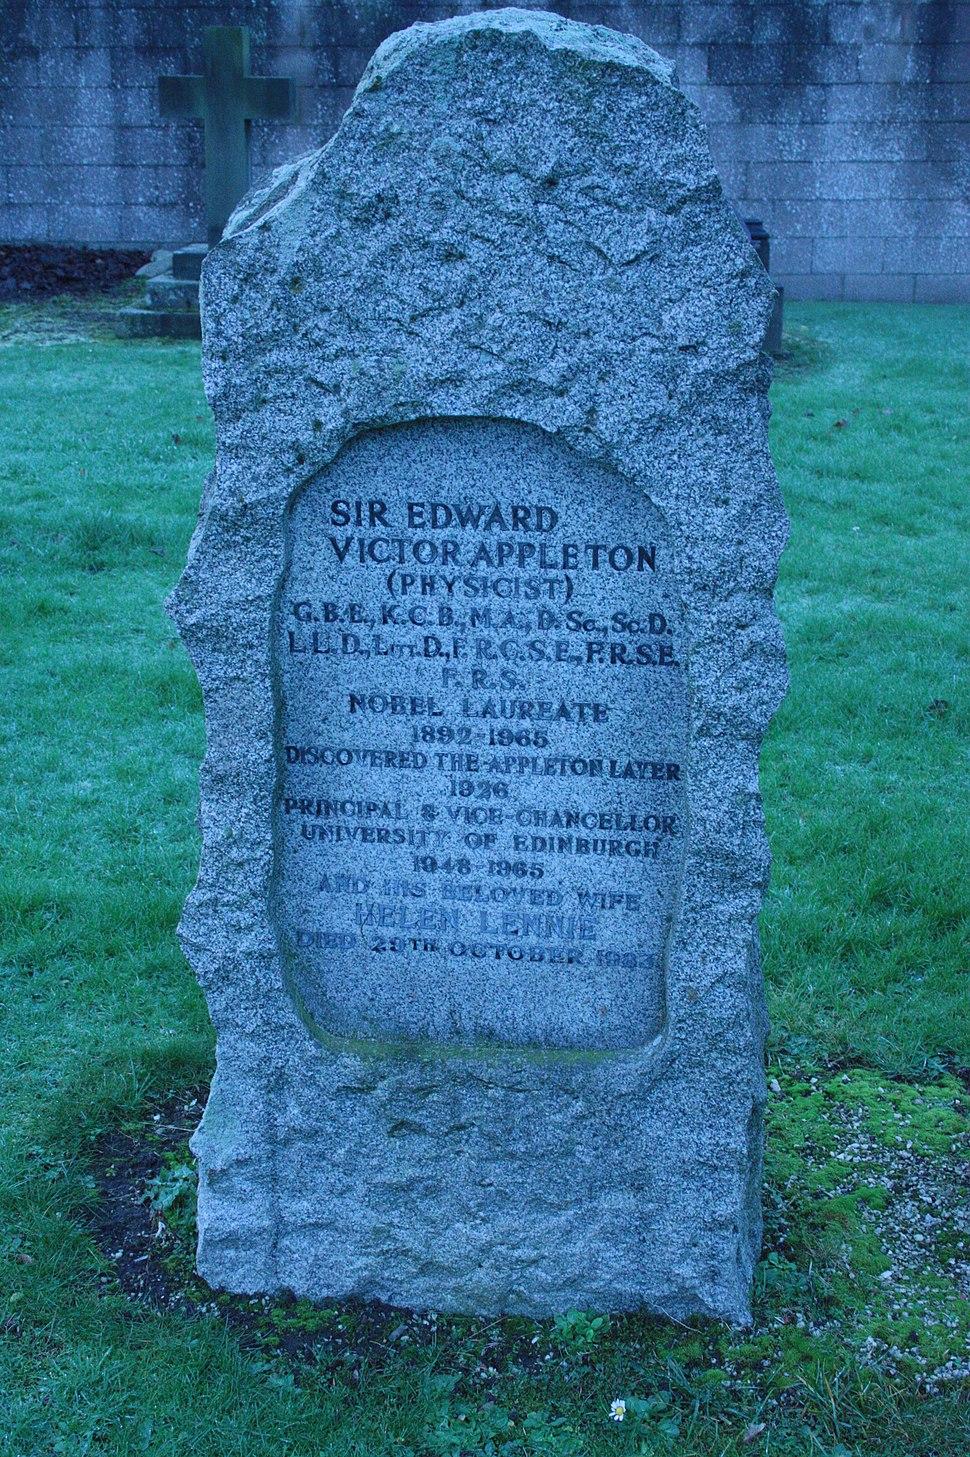 The grave of Sir Edward Victor Appleton, Morningside Cemetery, Edinburgh